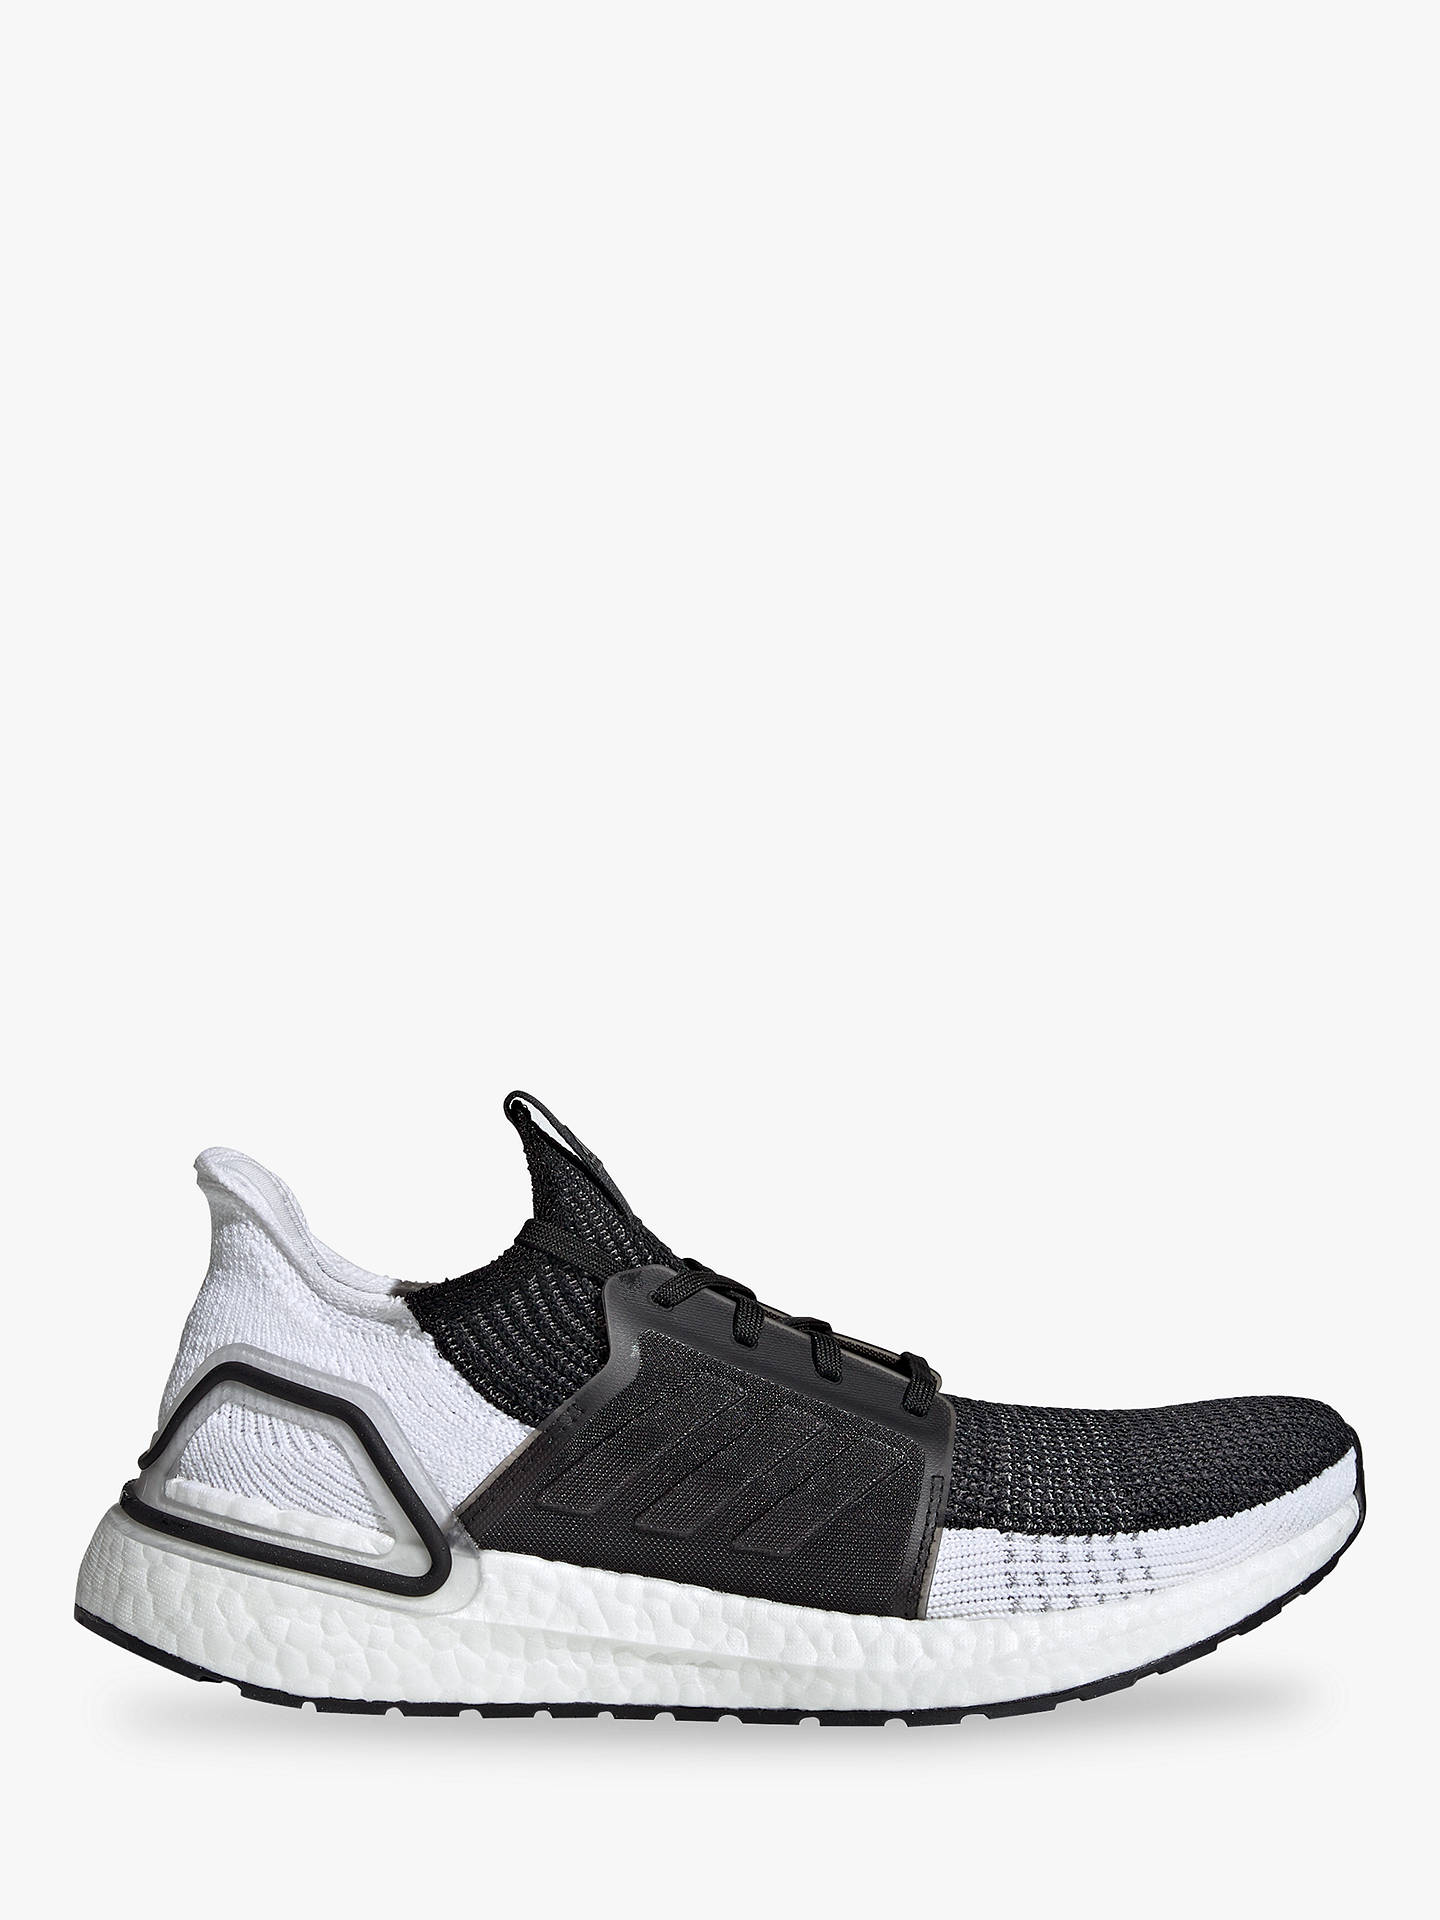 online retailer e154d ff7b2 Buyadidas UltraBOOST 19 Mens Running Shoes, Core Black Grey Six, 7 Online  at ...